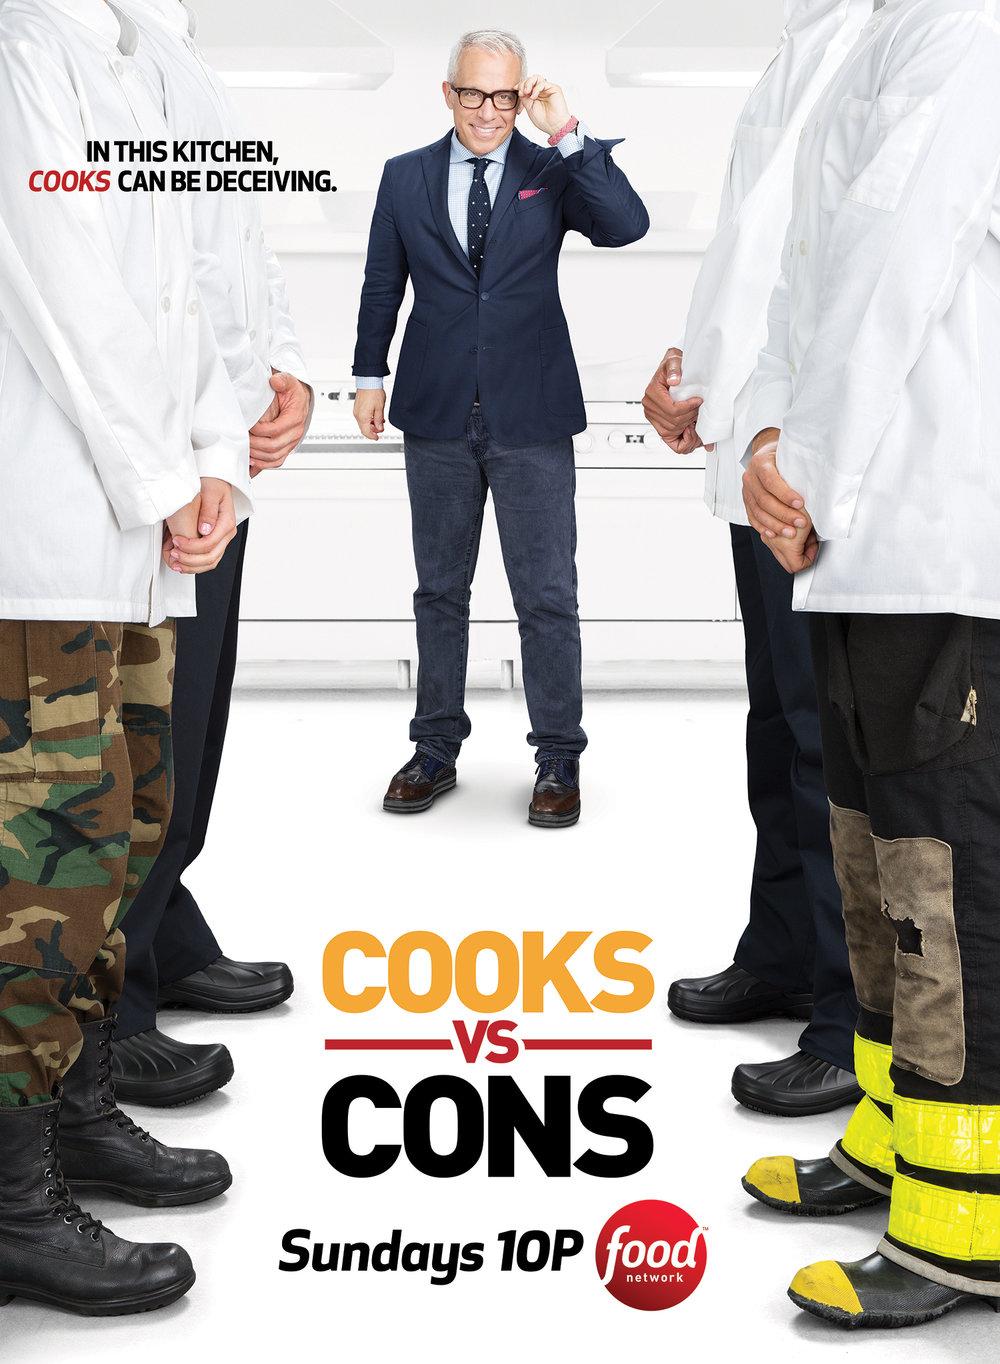 Food_Network_Cooks_vs_Cons_CVC_Hollowtree_30x22feet_HR-photo-(1).jpg